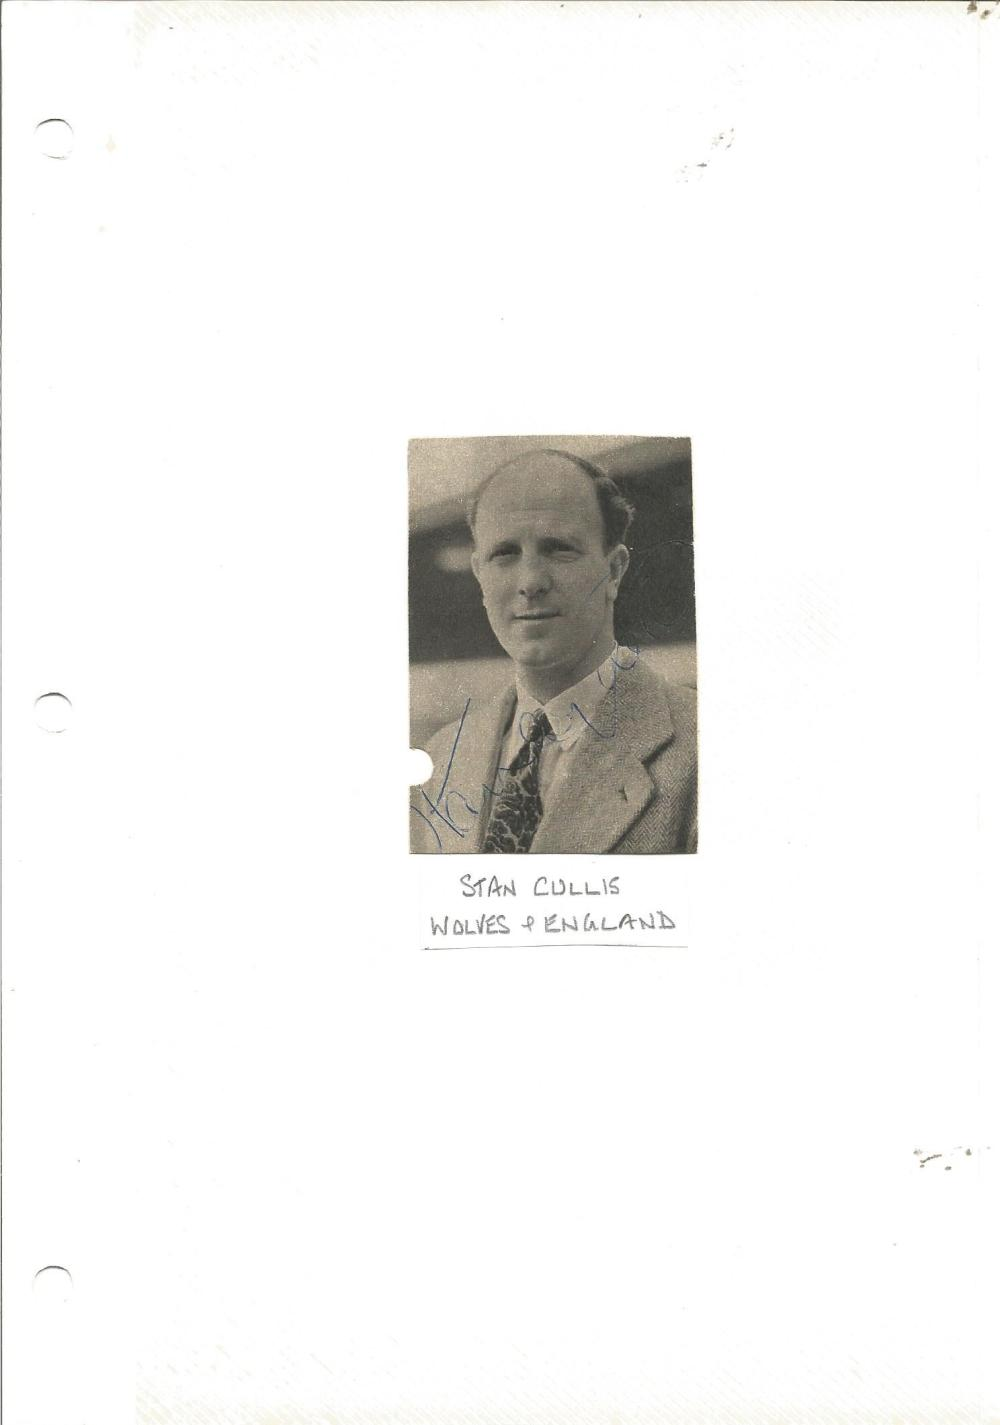 Football Legends Stan Cullis 3x2 signed b/w newspaper photo. Stanley Cullis (25 October 1916 - 28